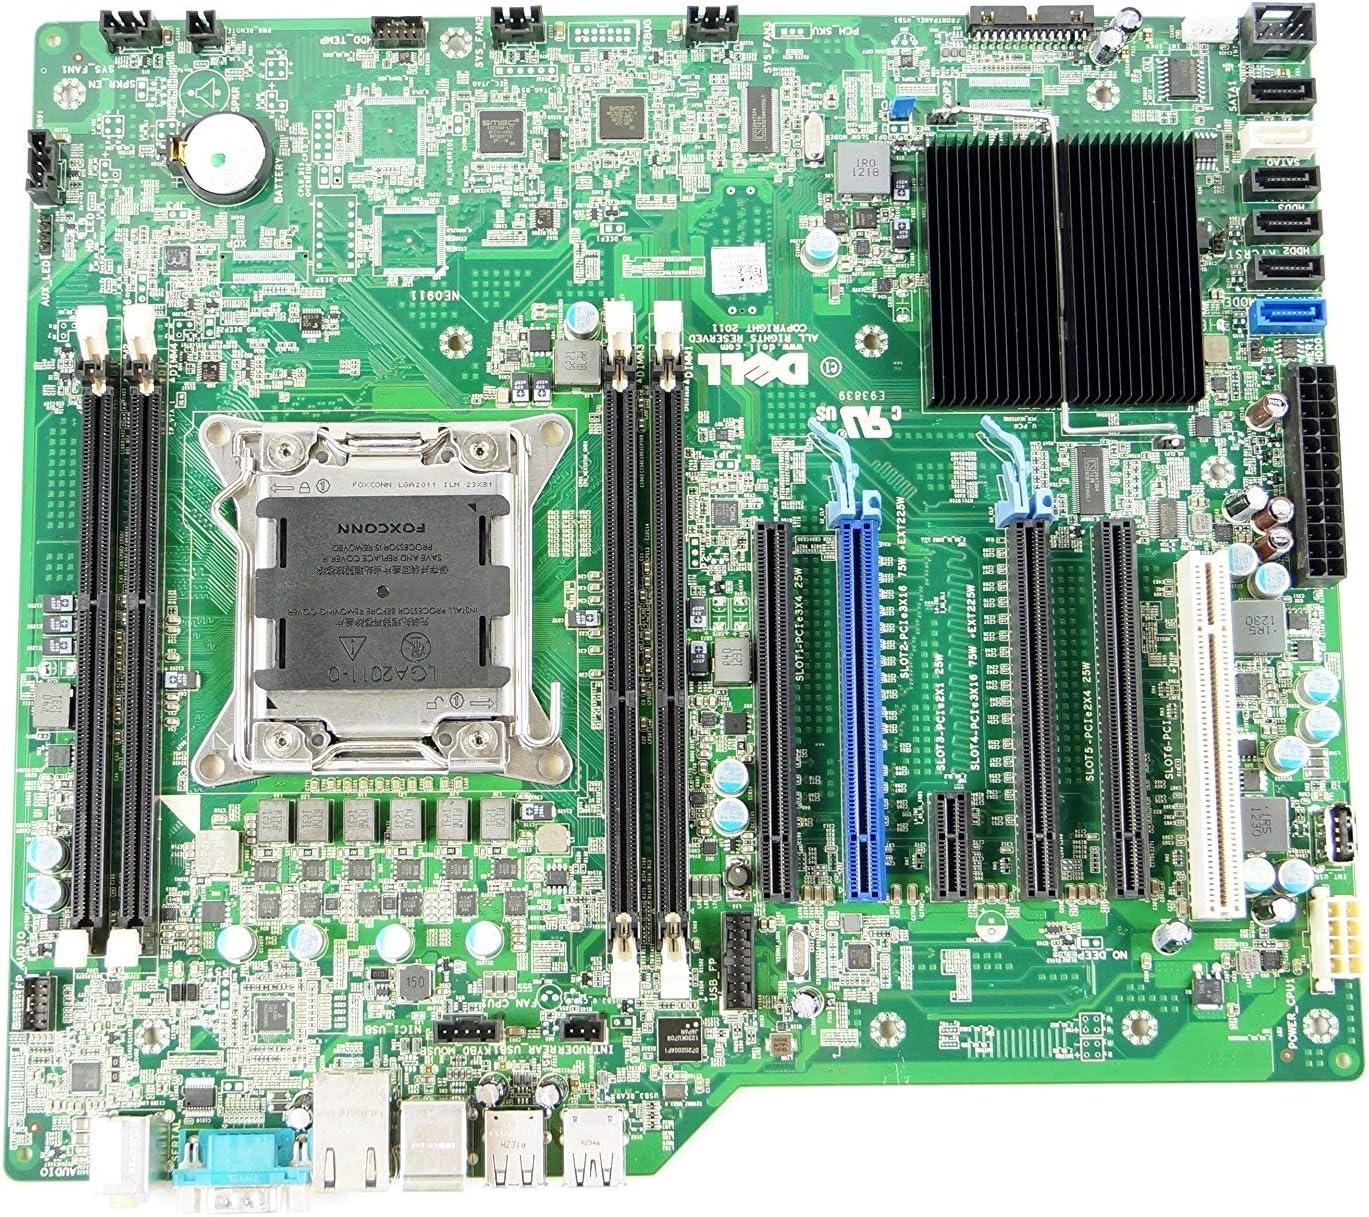 8HPGT Dell Precision T3600 Socket LGA 2011 ATX Desktop Motherboard (Certified Refurbished)